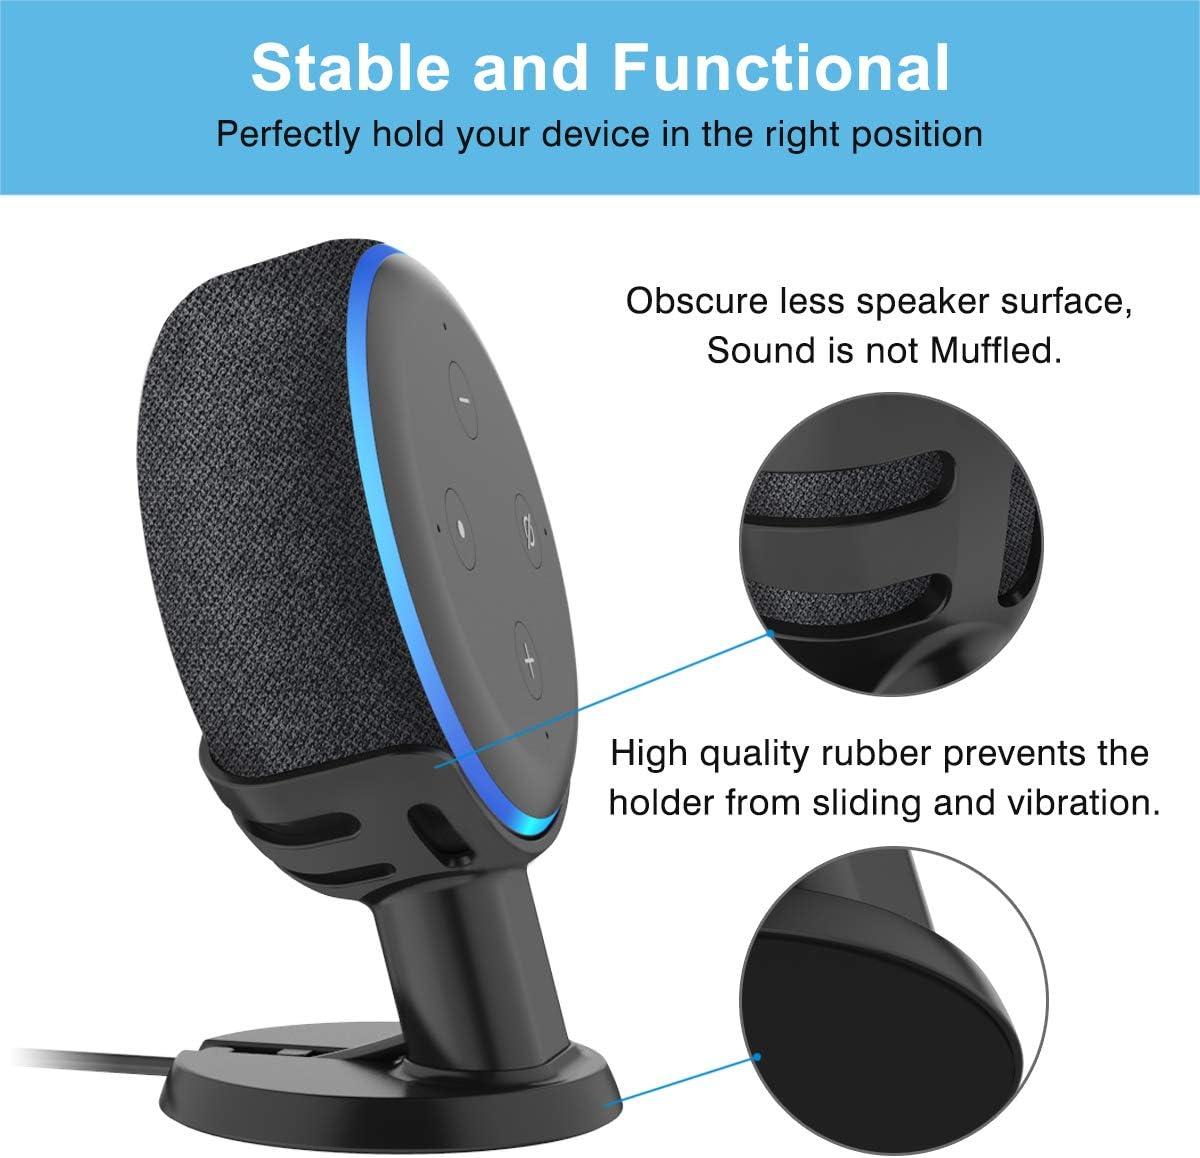 Improves Sound Visibility and Appearance Holder for Dot 3rd Gen 2 Pack-Black SPORTLINK Desk/&Table Mount Stand for Eco Dot 3rd Generation